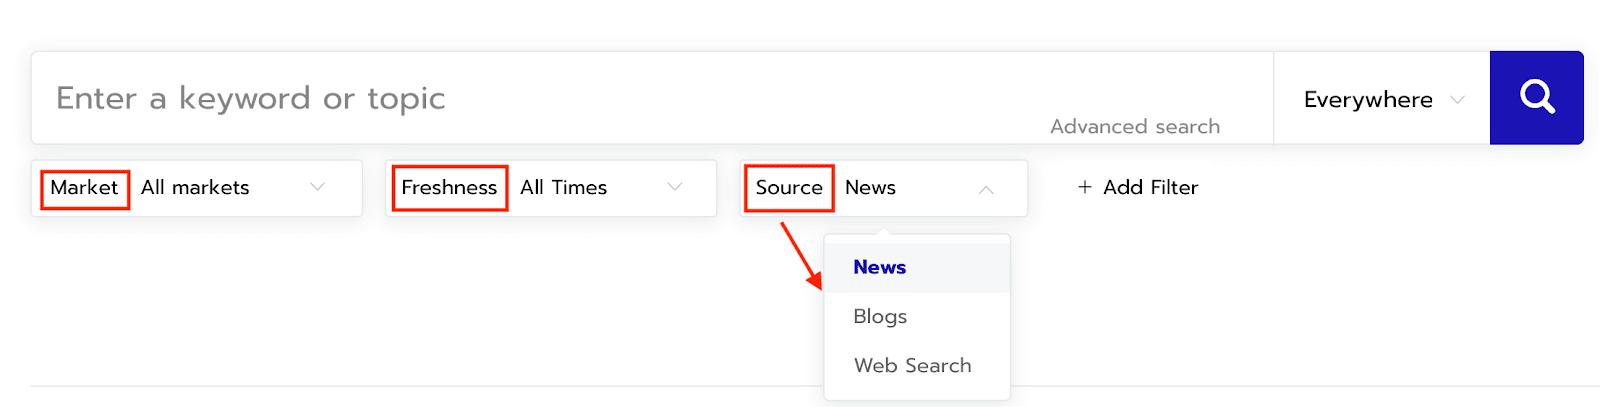 Respona Content Search Tool